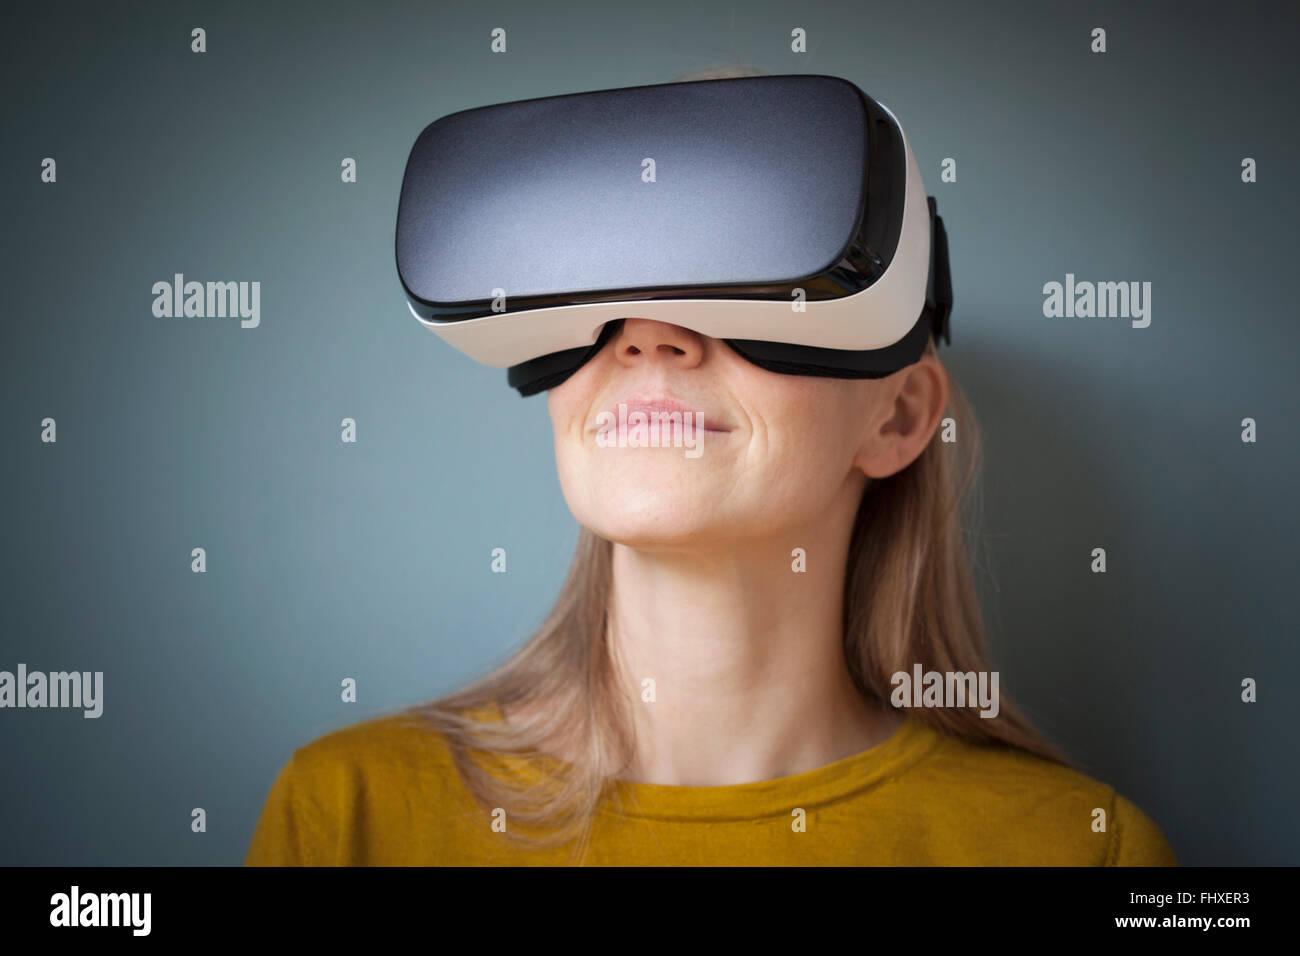 69a6e9d8e401 Virtual Reality Stock Photos   Virtual Reality Stock Images - Alamy